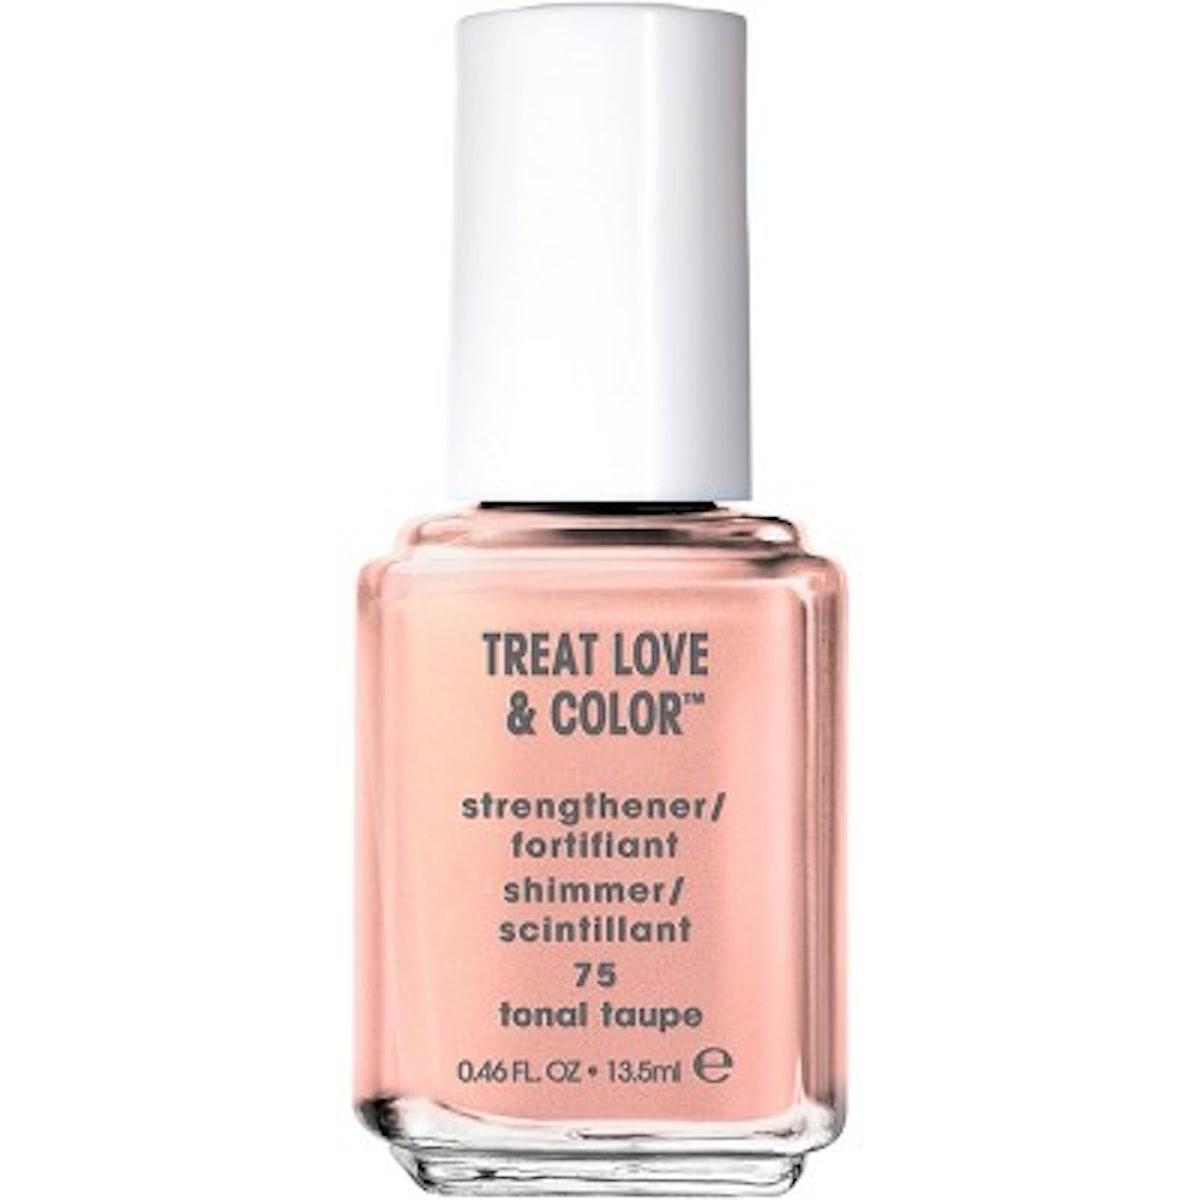 Essie Treat Love & Color Nail Polish - 0.46 fl oz in Tonal Taupe